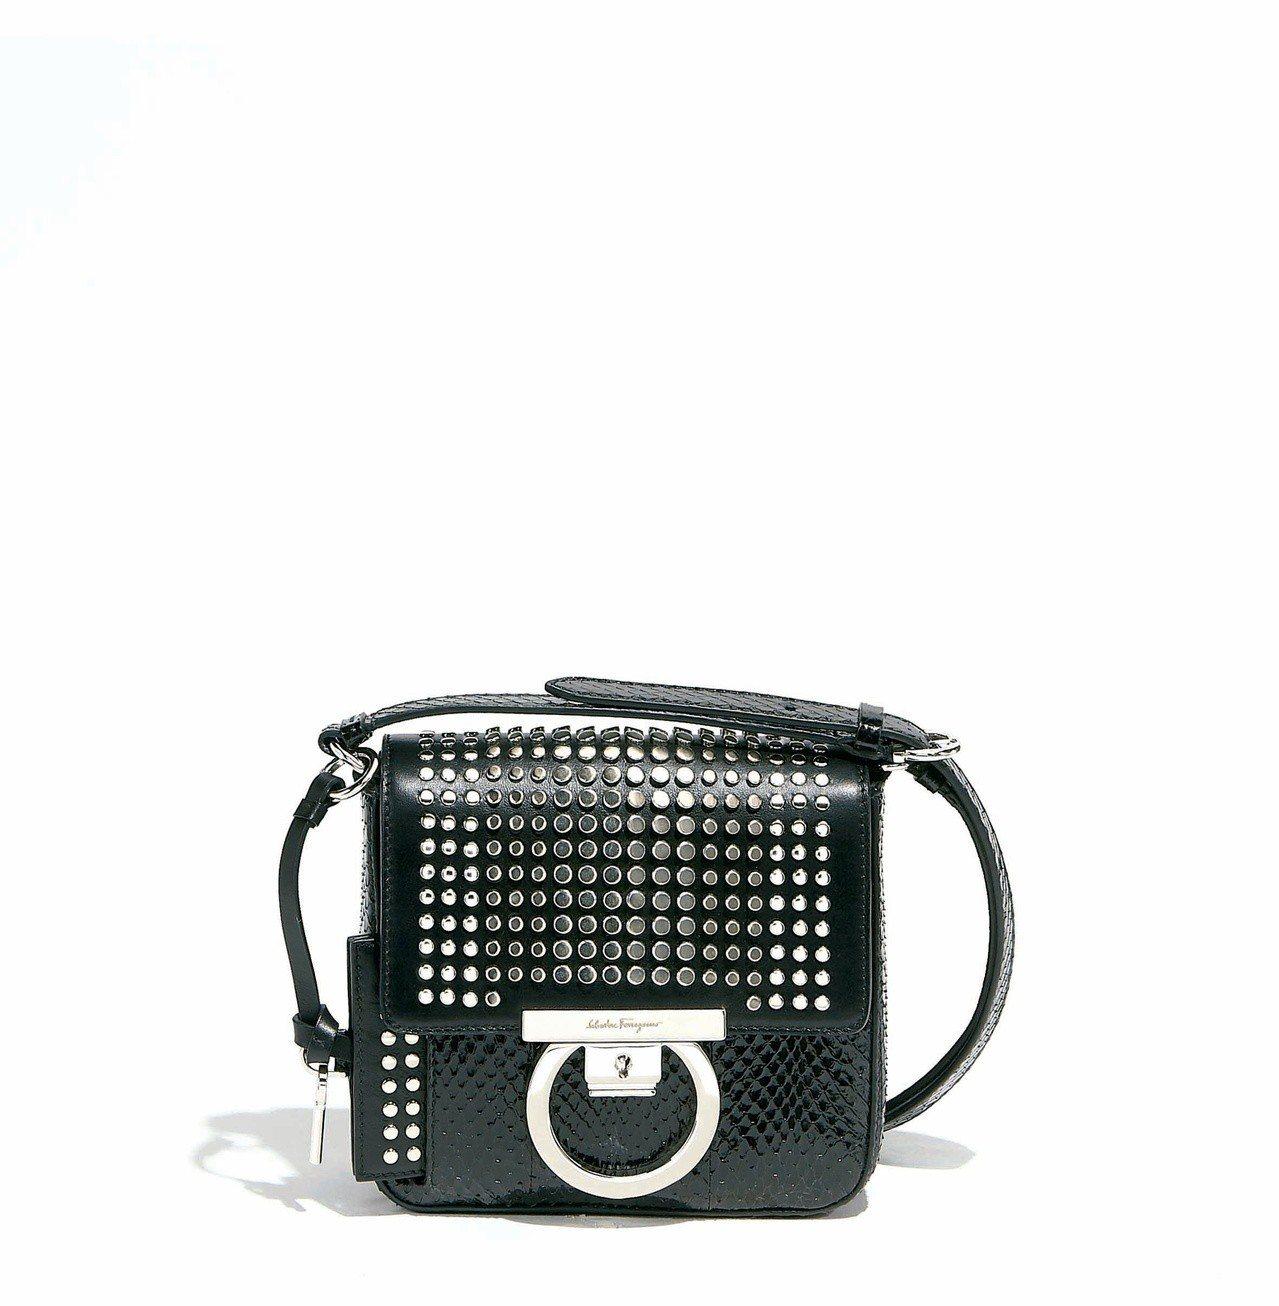 Gancino Lock黑色蛇皮與小牛皮拼接肩背包,售價68,900元。圖/Sa...